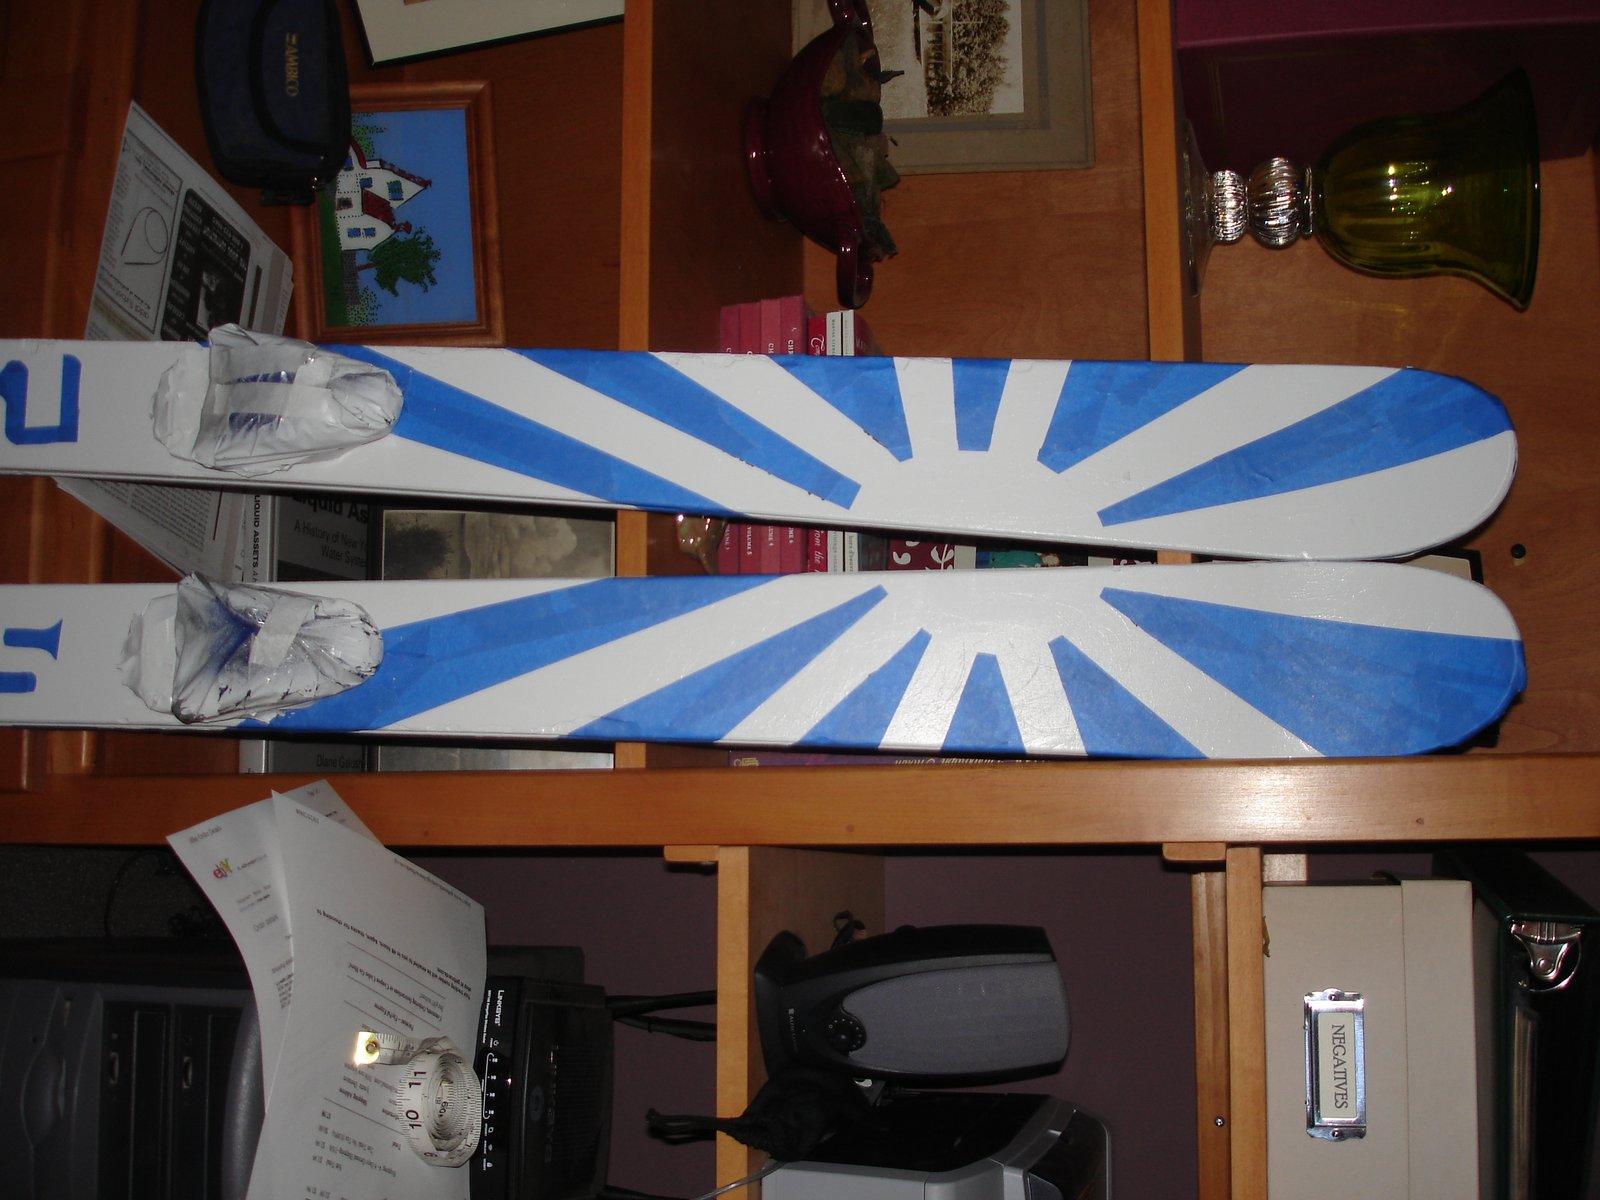 My skis.